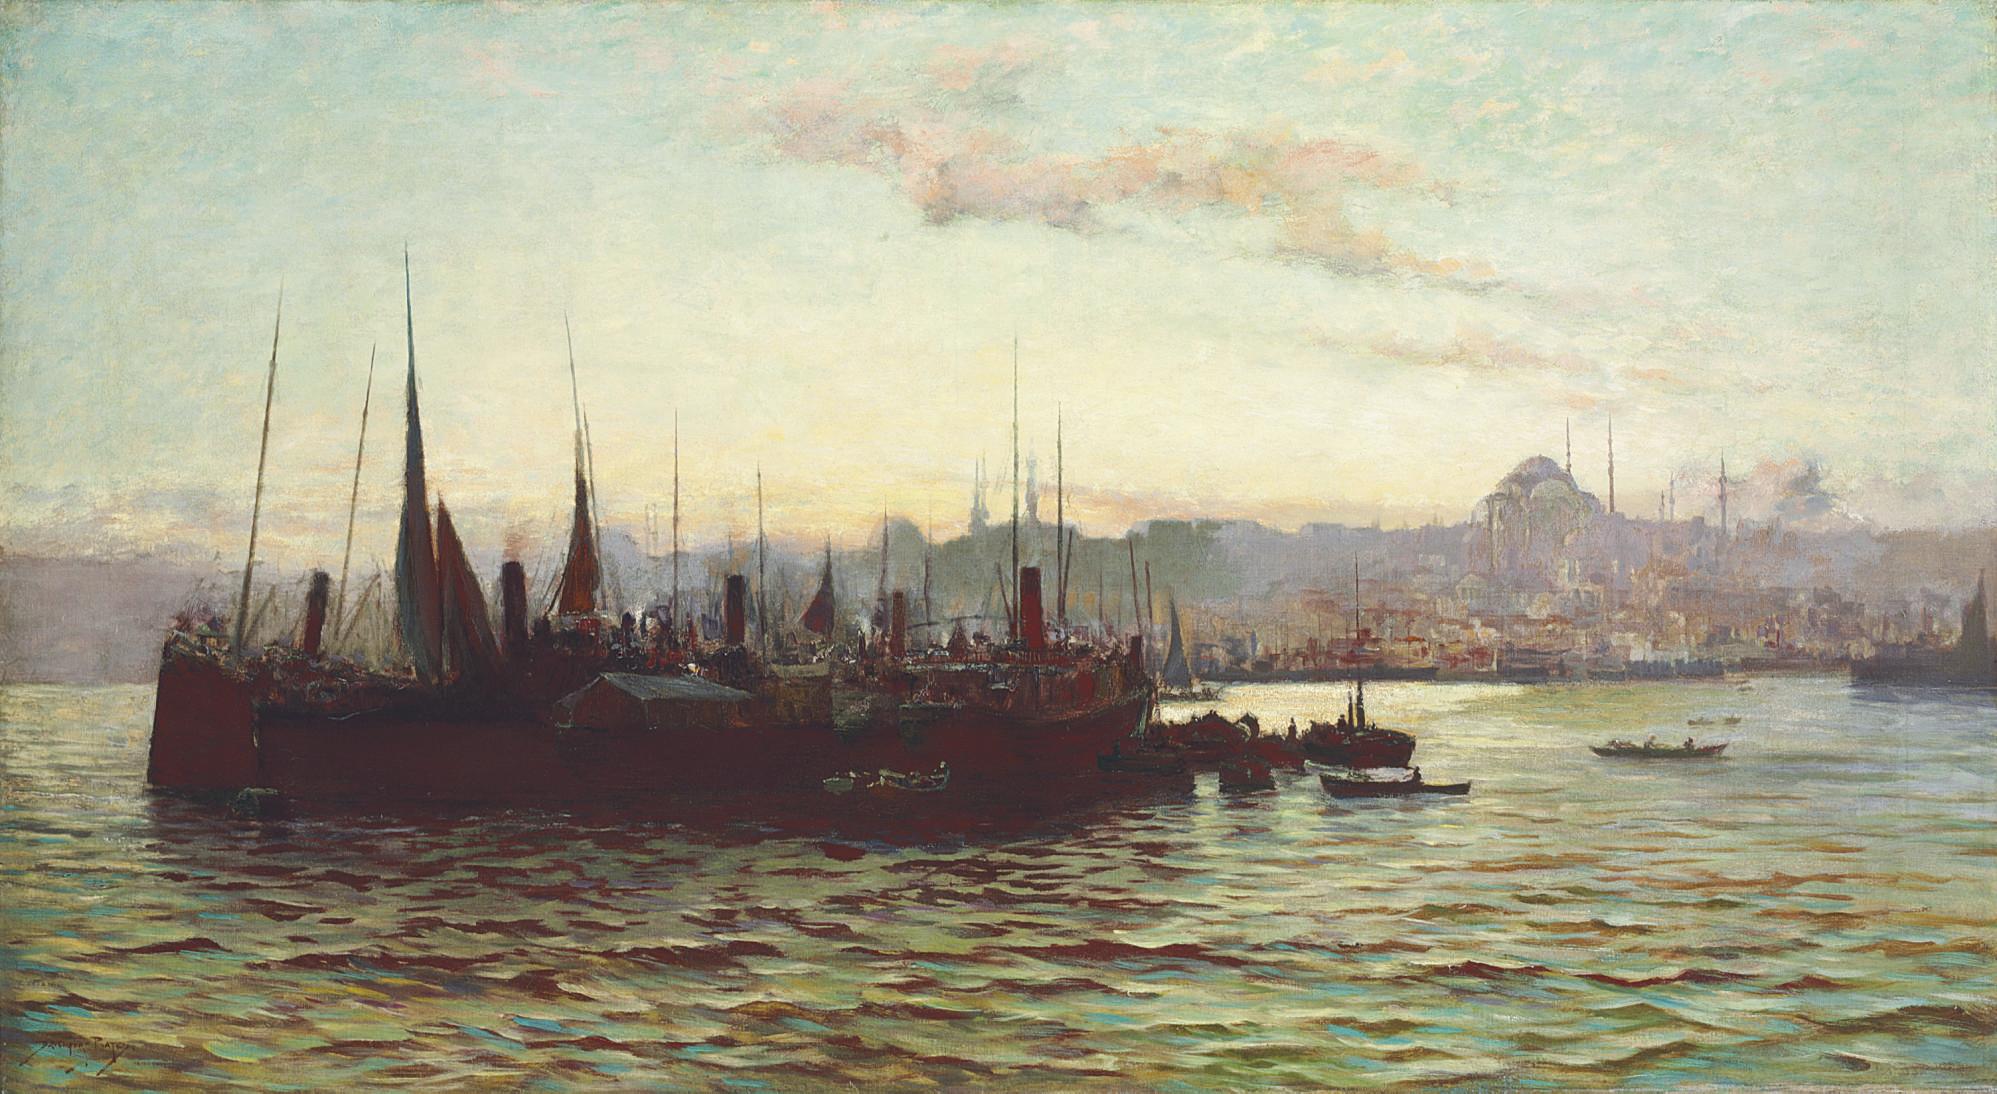 Frederick Davenport Bates (Bri